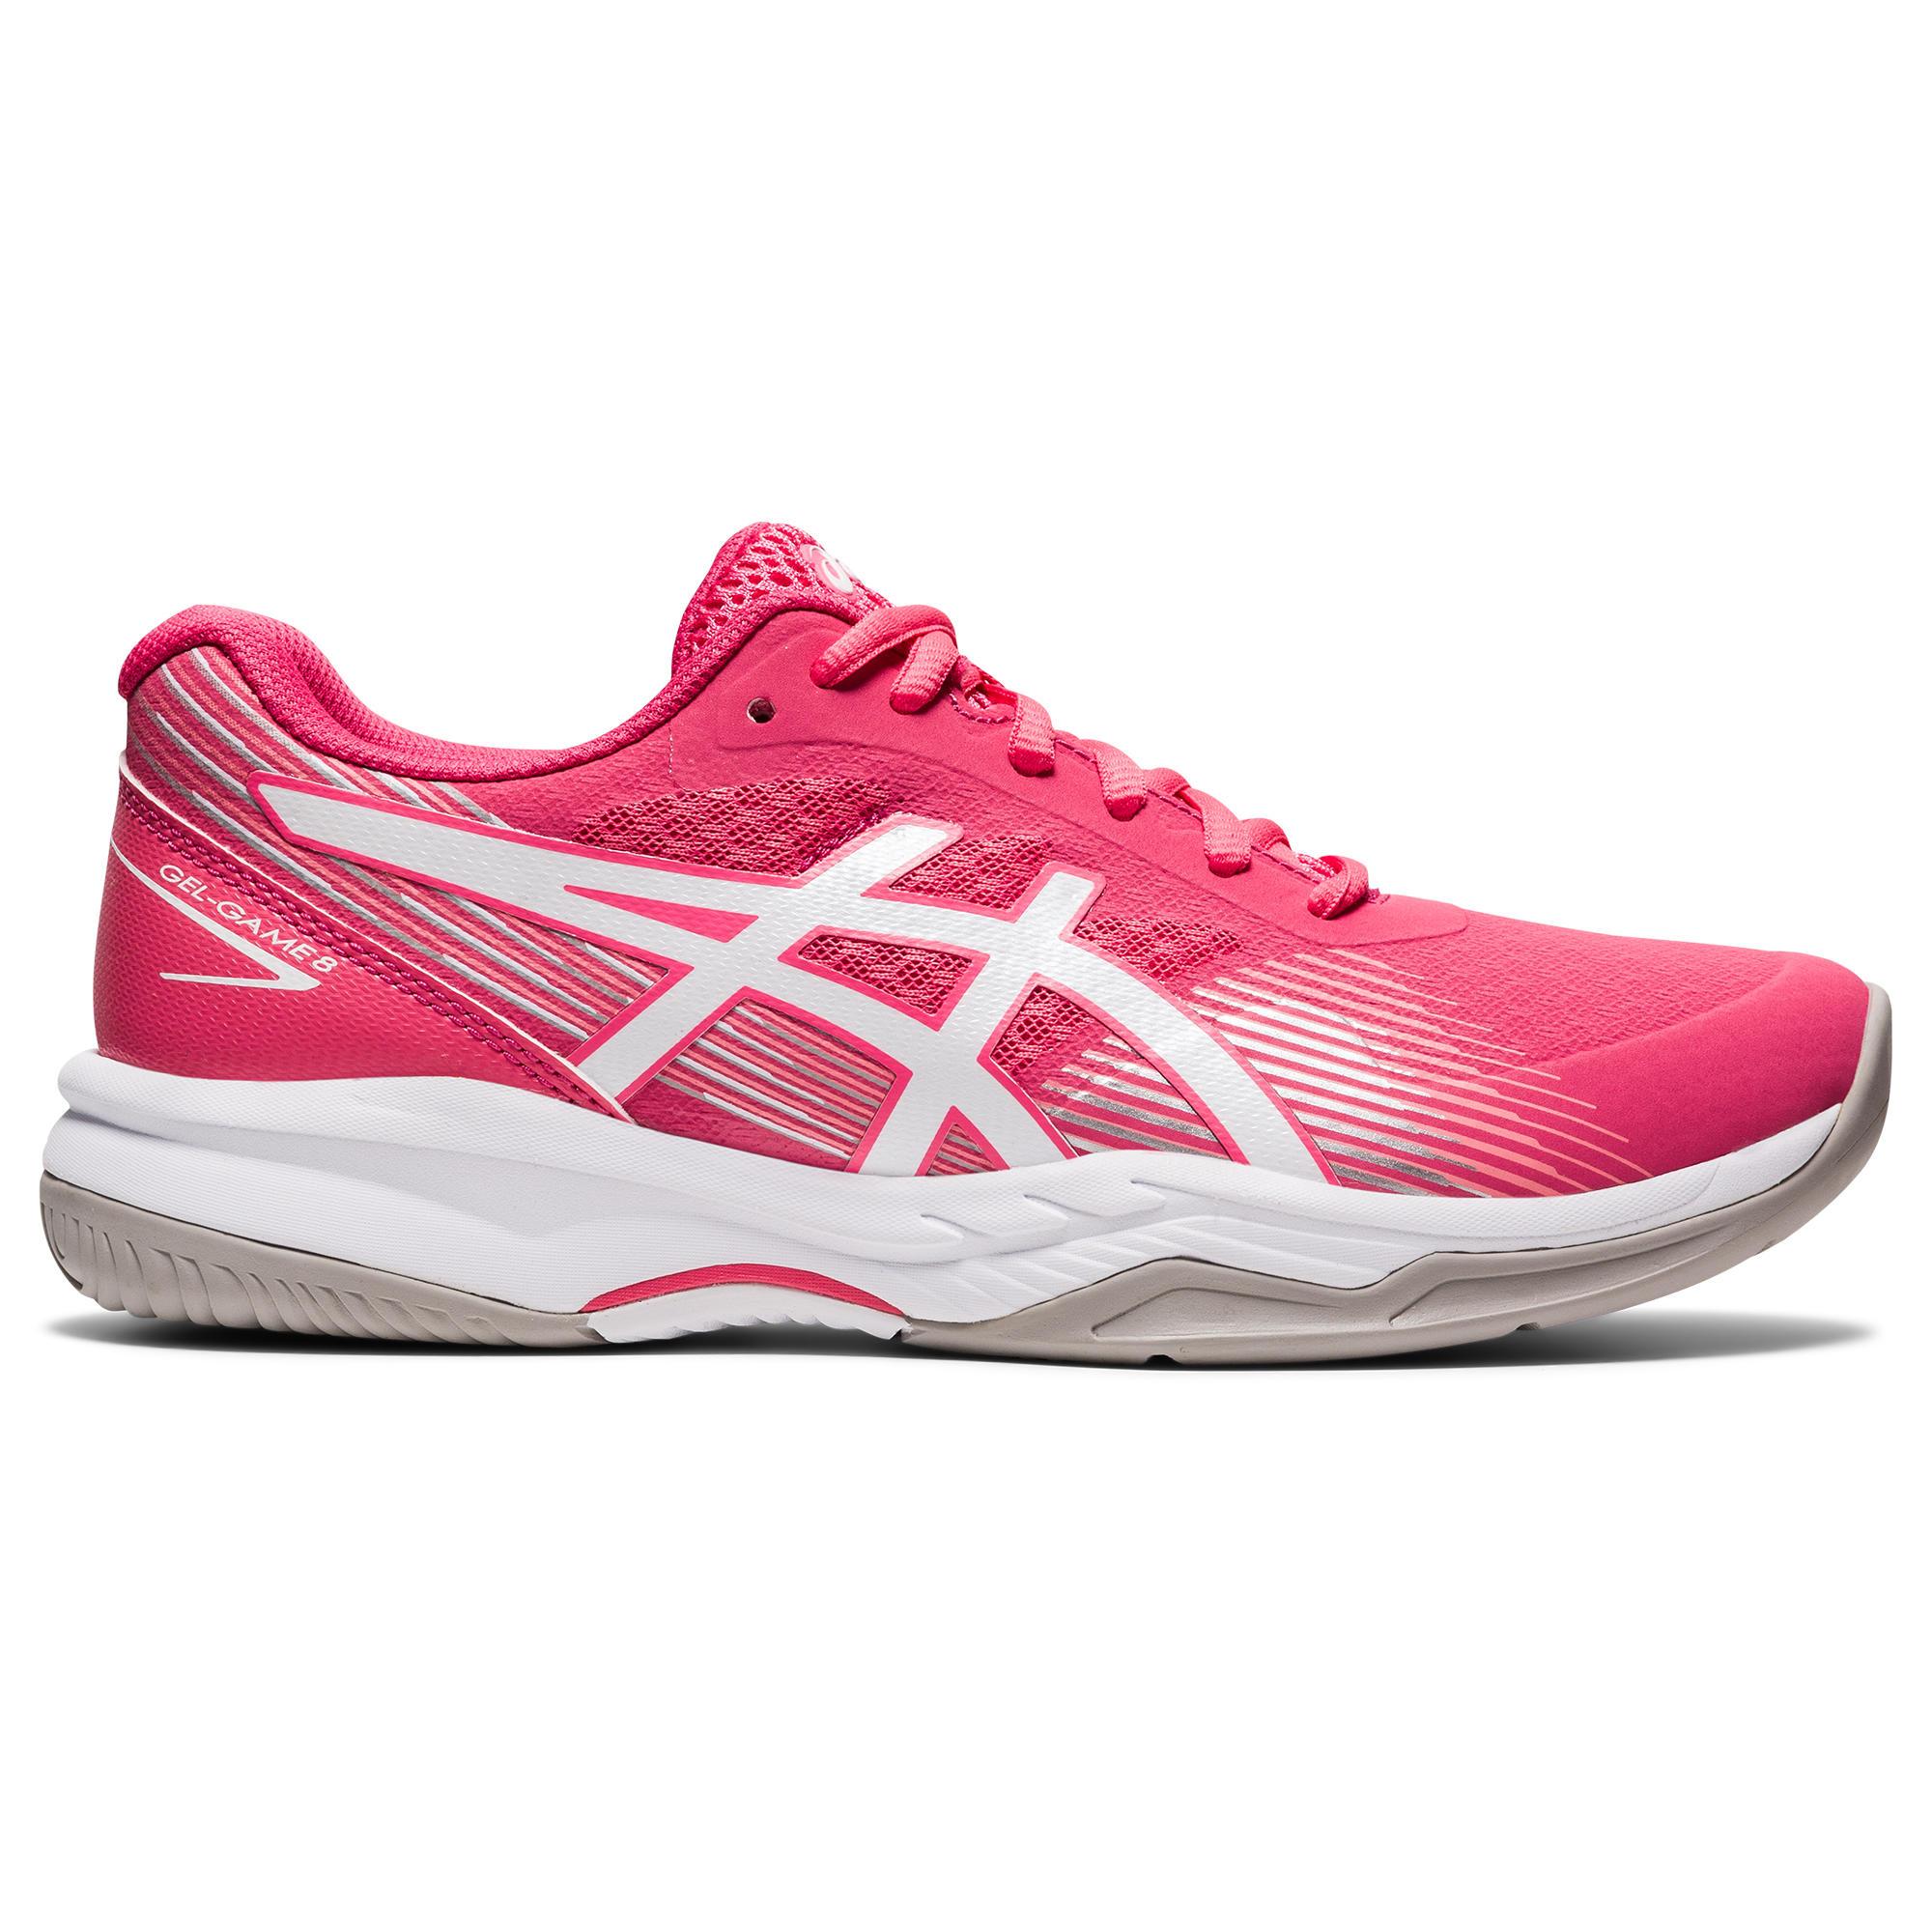 Asics Scarpe tennis donna GEL GAME 8 rosa-bianco